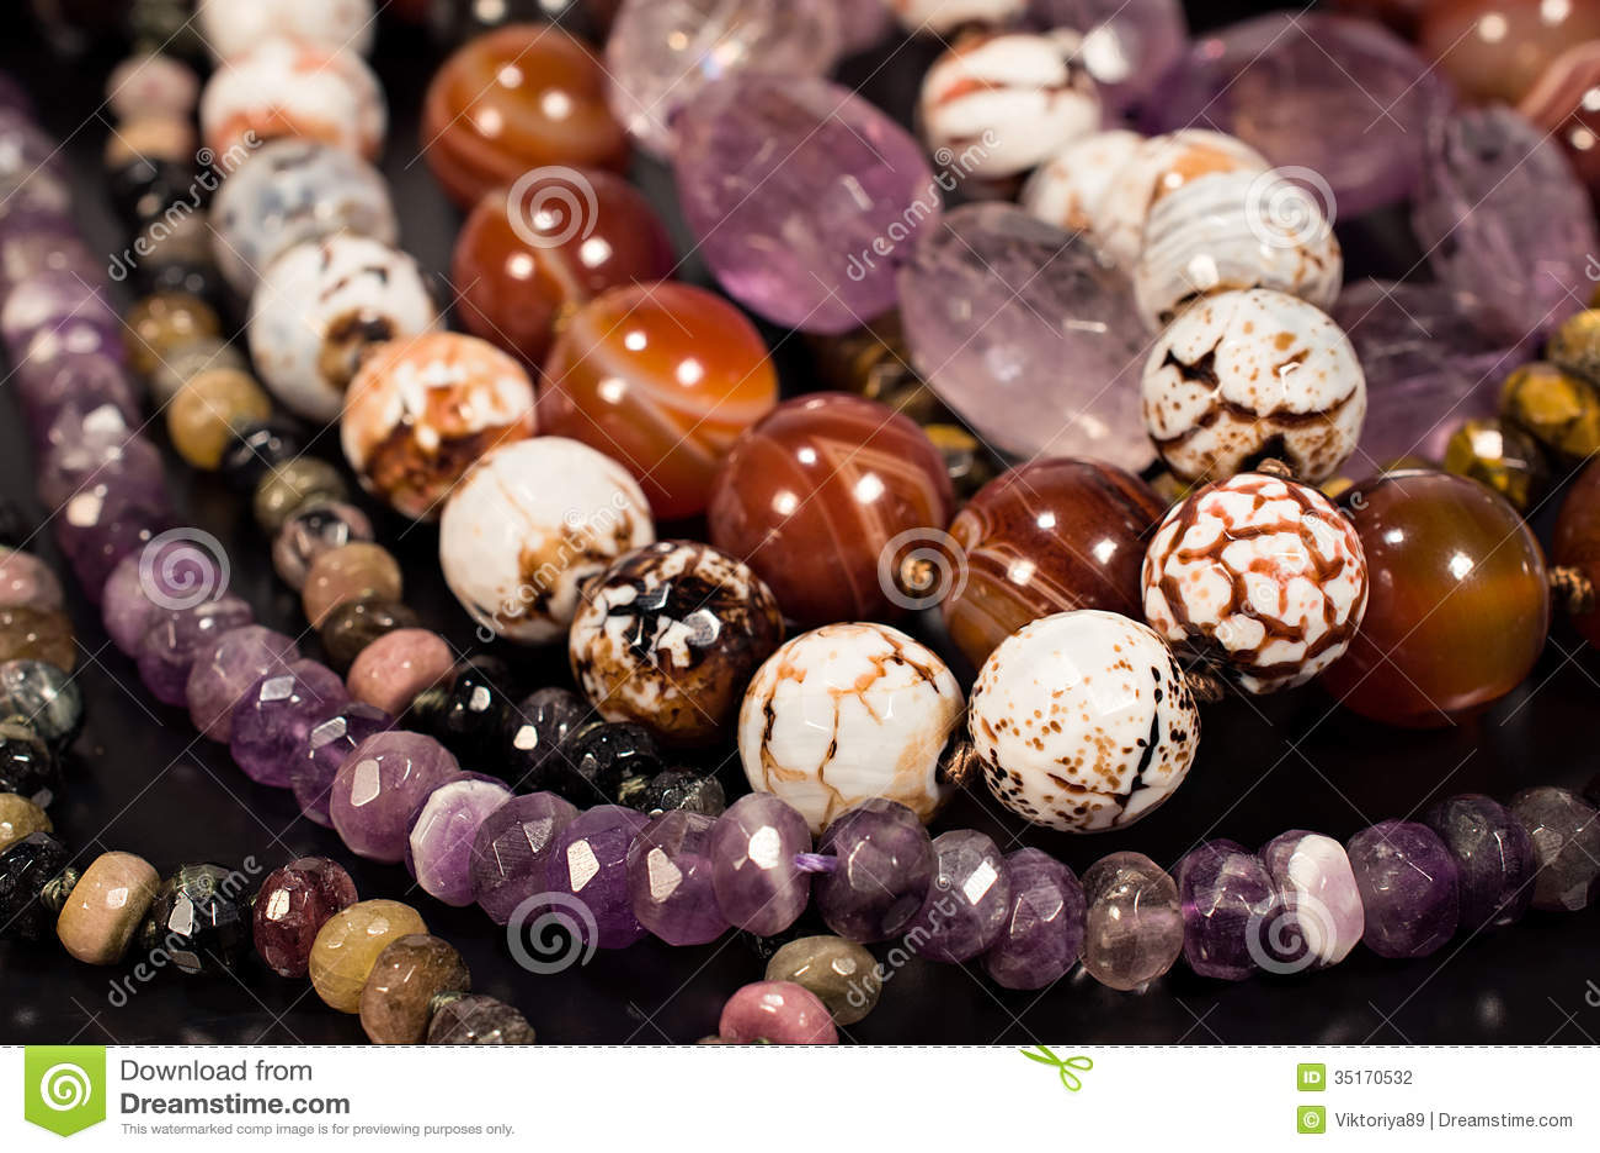 perles de diff rentes pierres en gros plan. Black Bedroom Furniture Sets. Home Design Ideas